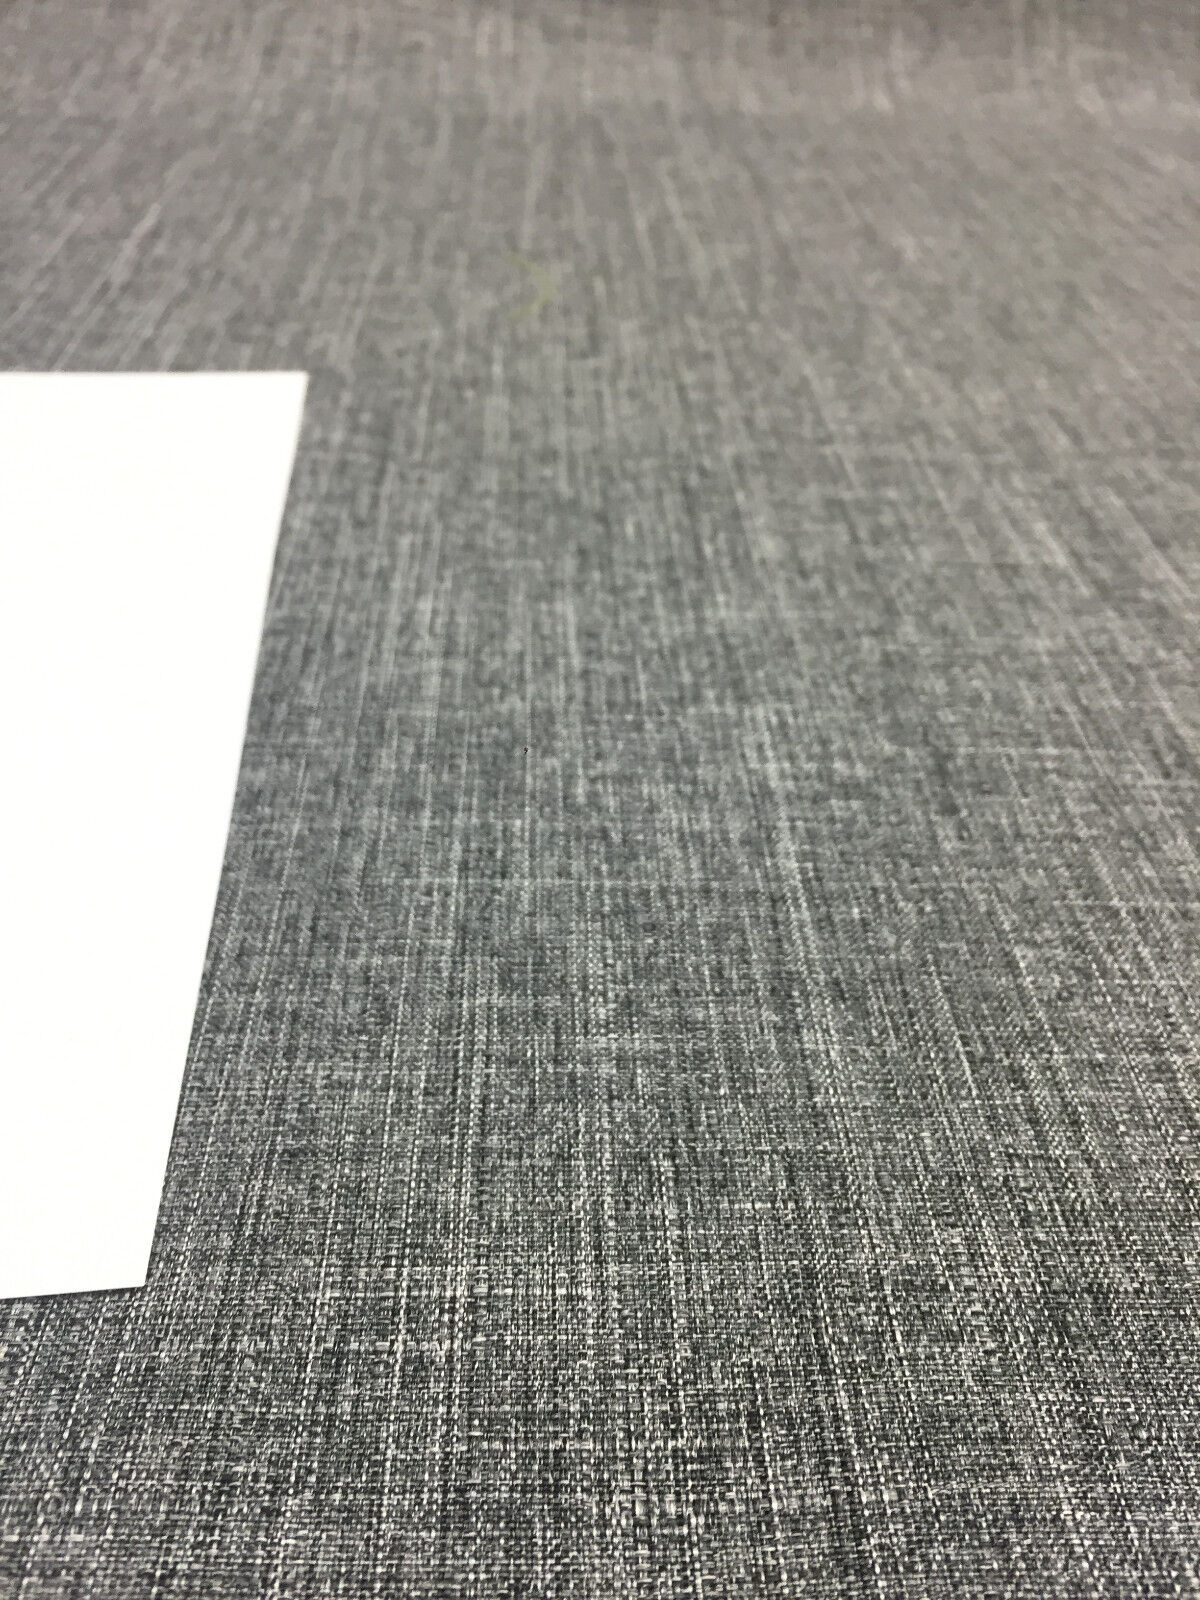 30 yard roll Milo Ash gray Denim look Drapery upholstery Multipurpose Fabric